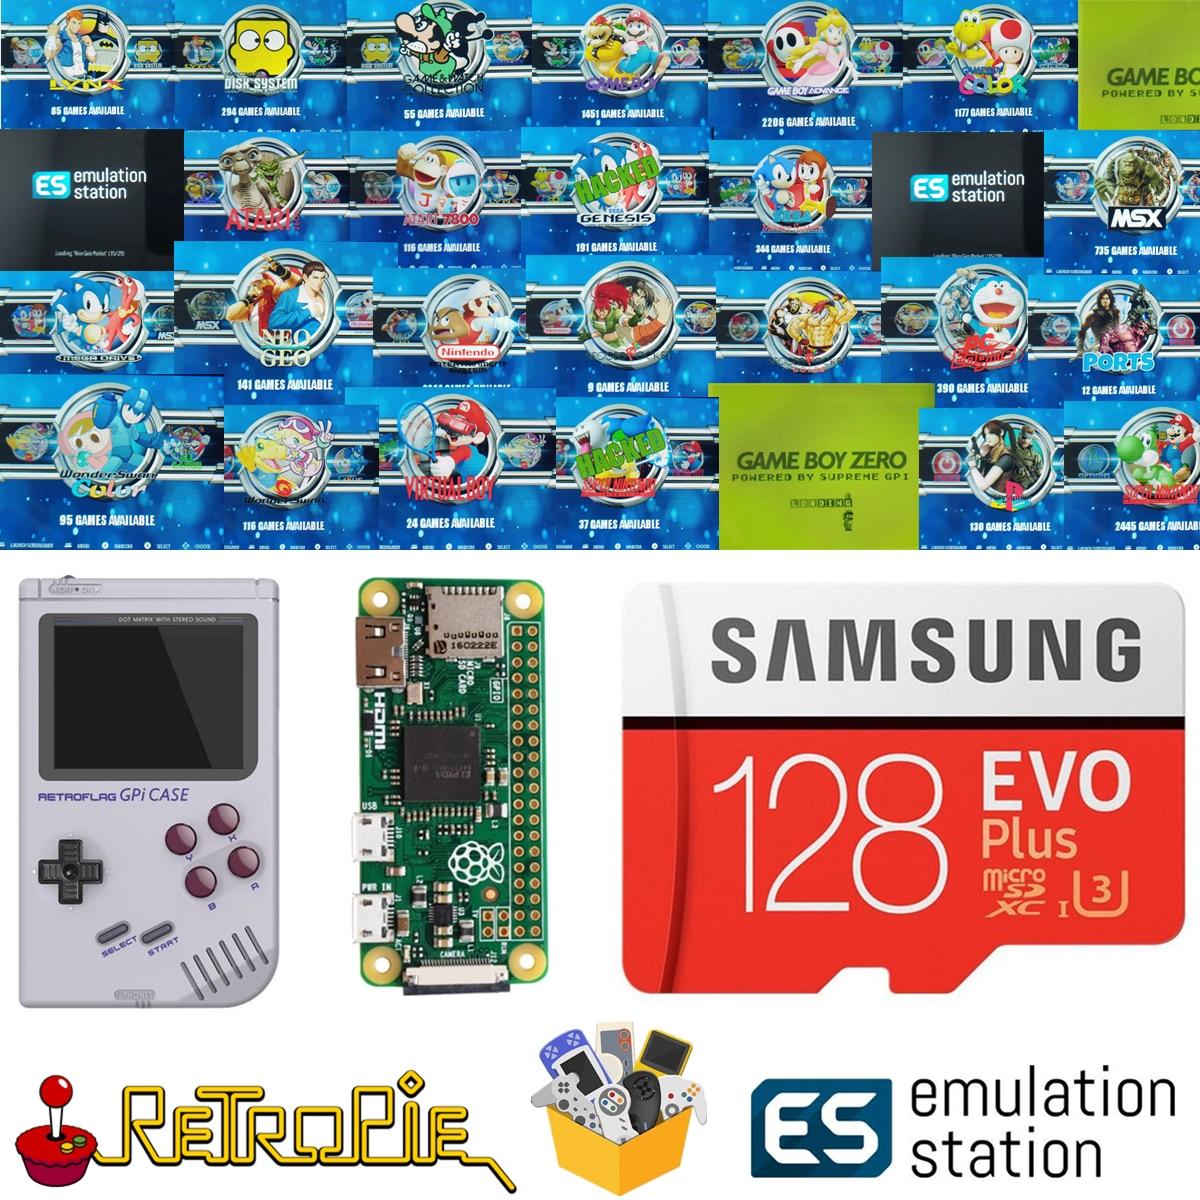 128 ГБ Retropie эмуляционная станция SD-карта для вашего GPi чехол Raspberry Pi Zero 14000 + игры FC NES SNES GBA PS NEOGEO ATARI LYNX